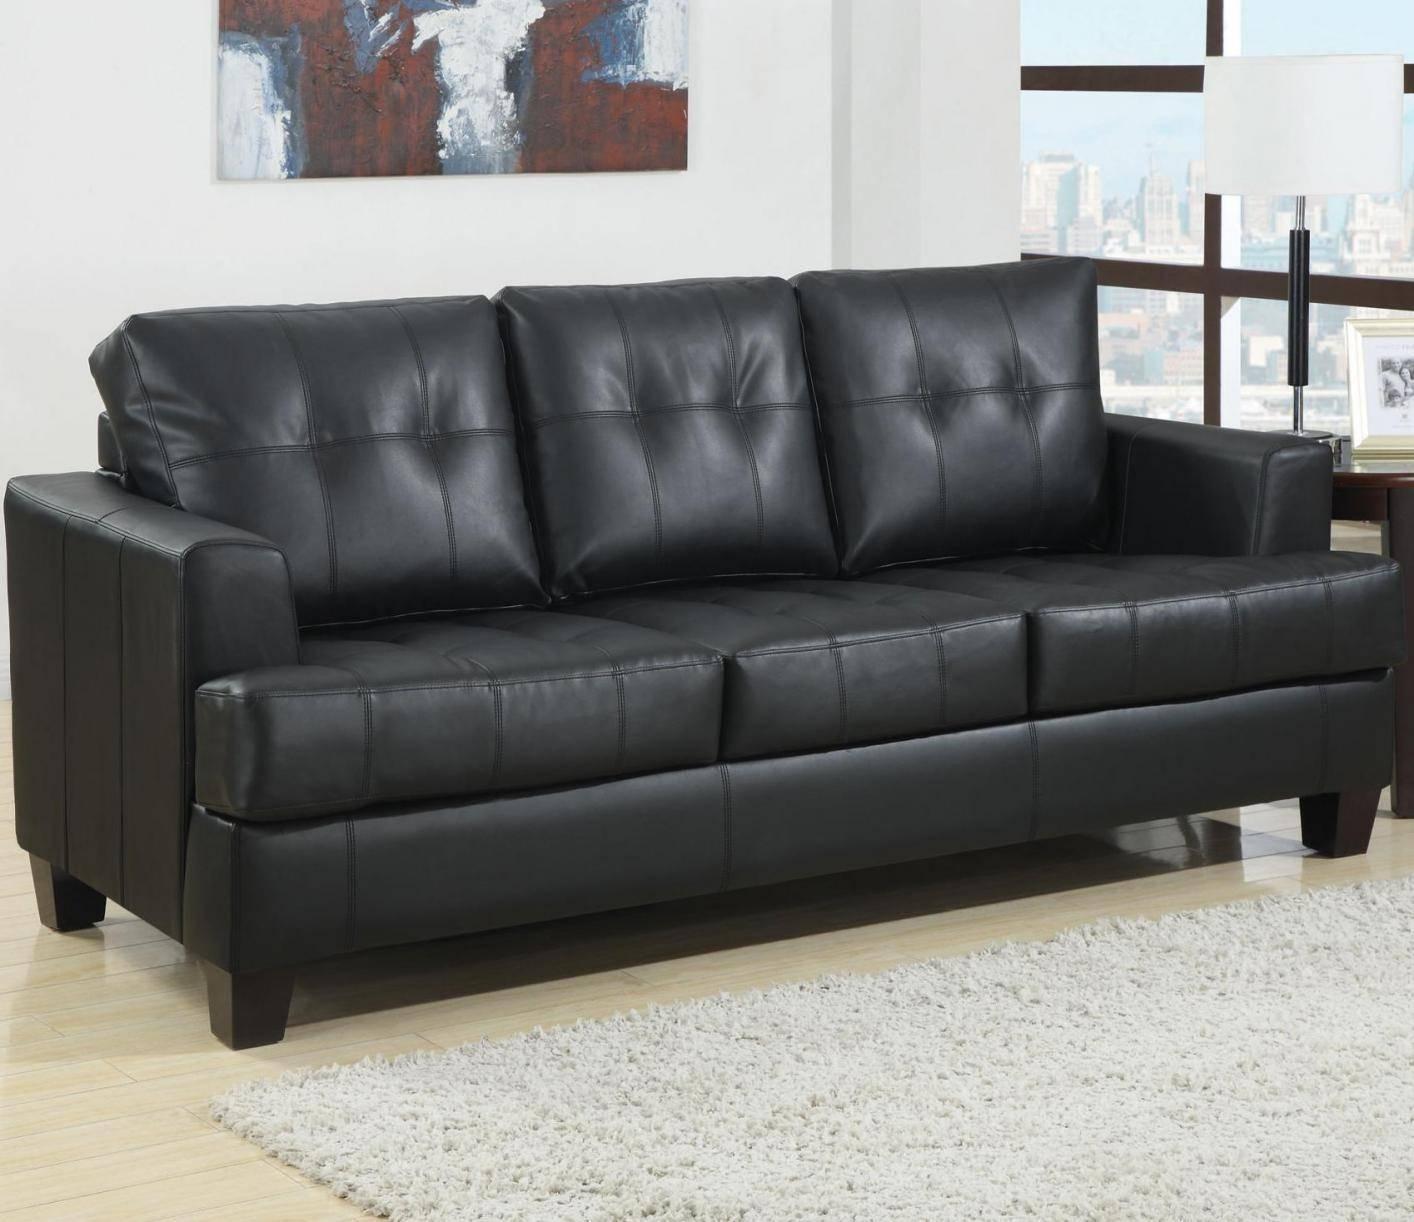 20 Top Craigslist Sleeper Sofas | Sofa Ideas In Craigslist Sleeper Sofas (View 4 of 15)